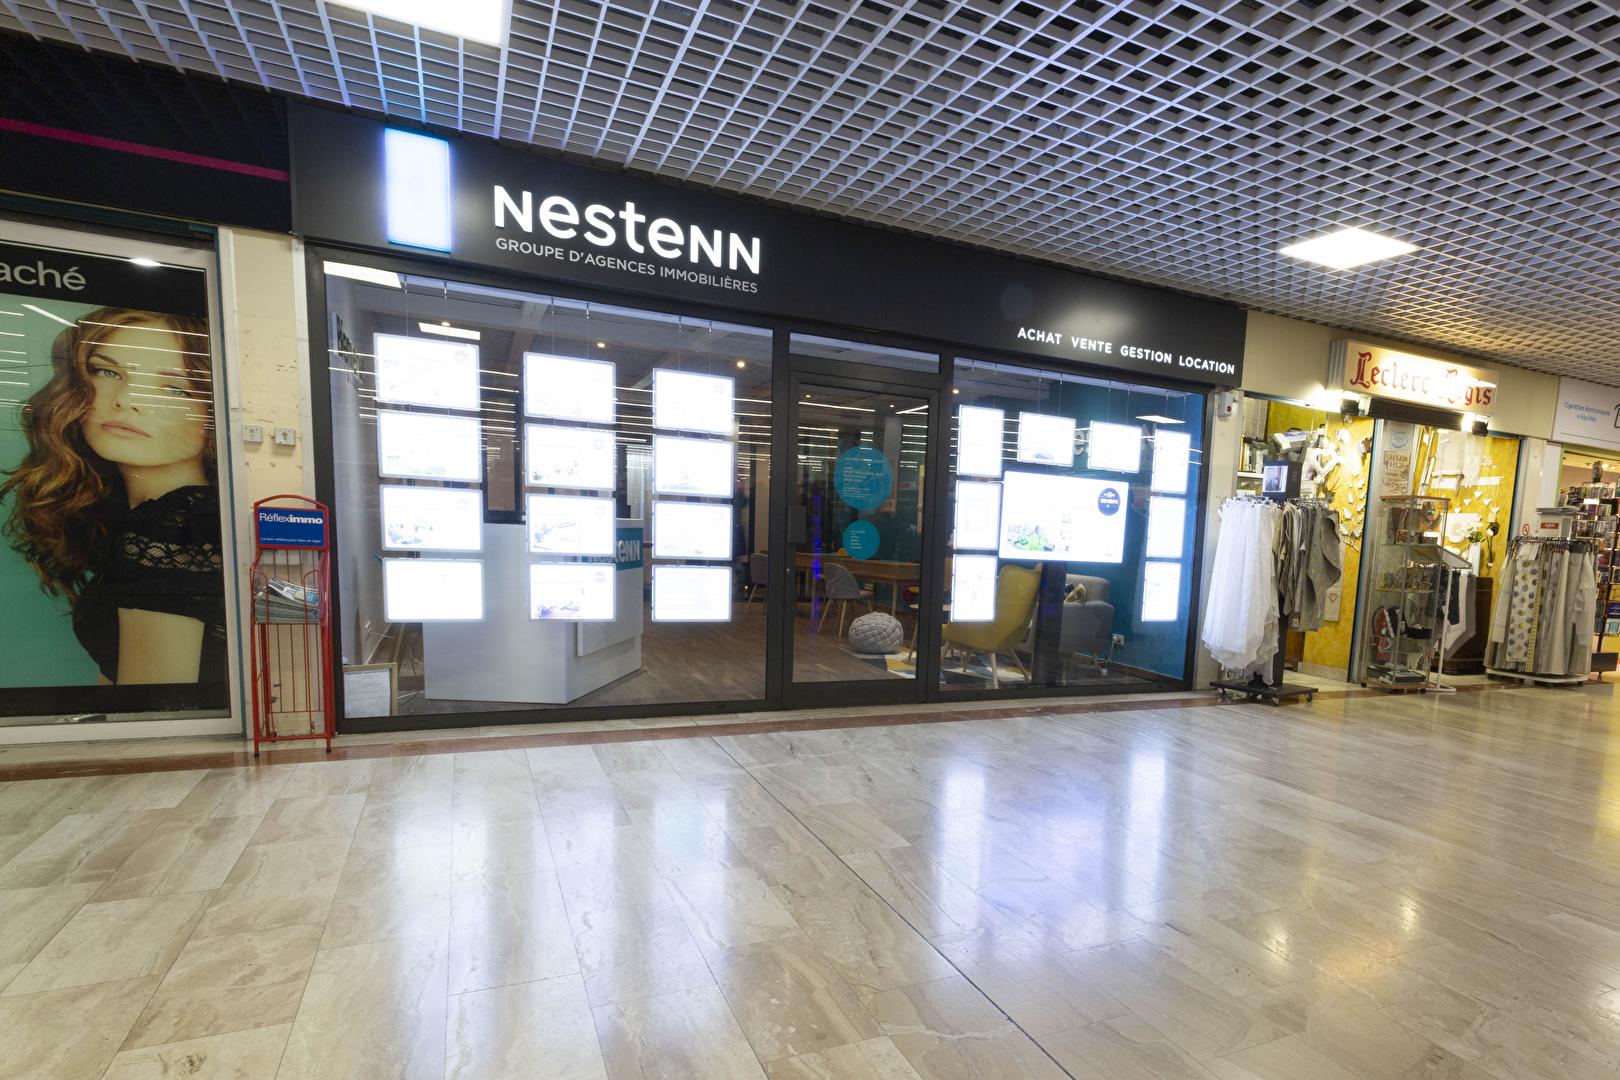 Immobilier Neuilly-sur-Marne 93330 Nestenn